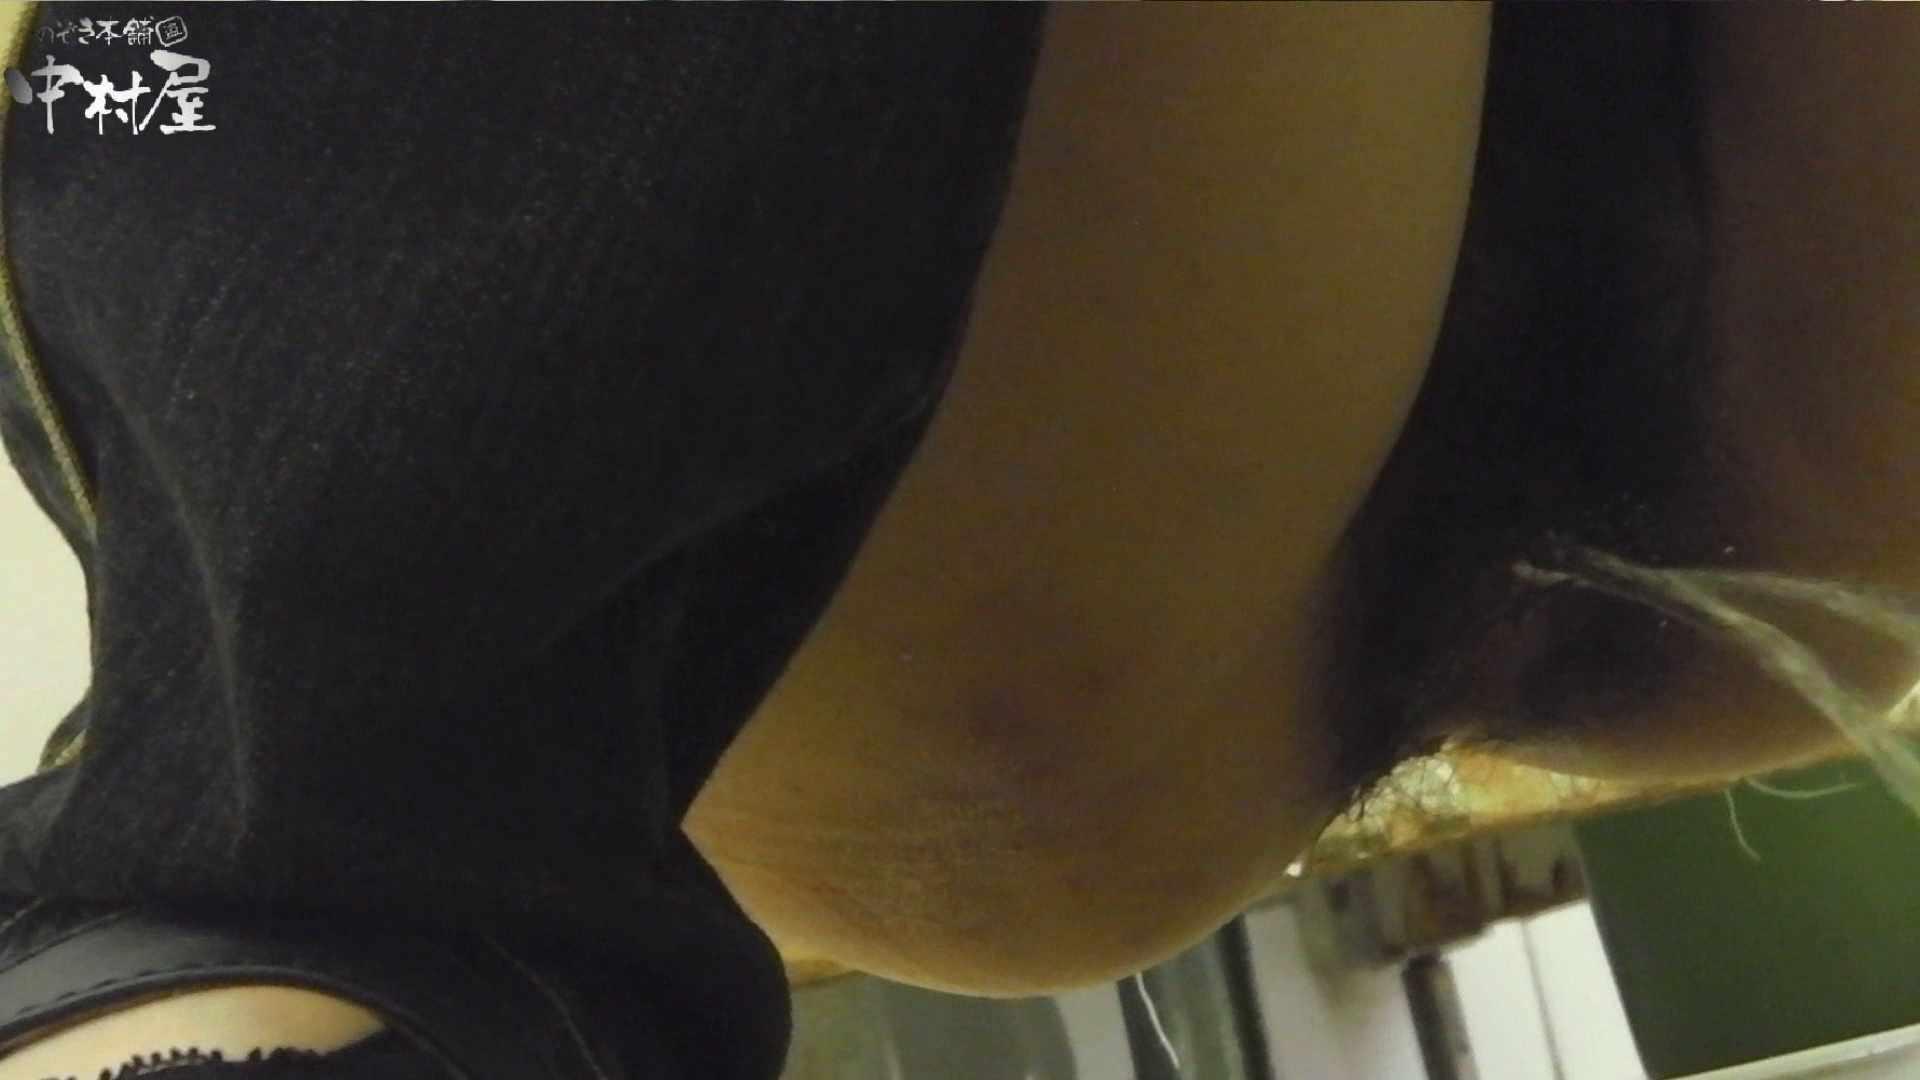 vol.51 命がけ潜伏洗面所! お嬢様チック・硬度並・推定80g 洗面所 盗み撮りAV無料動画キャプチャ 93PICs 87